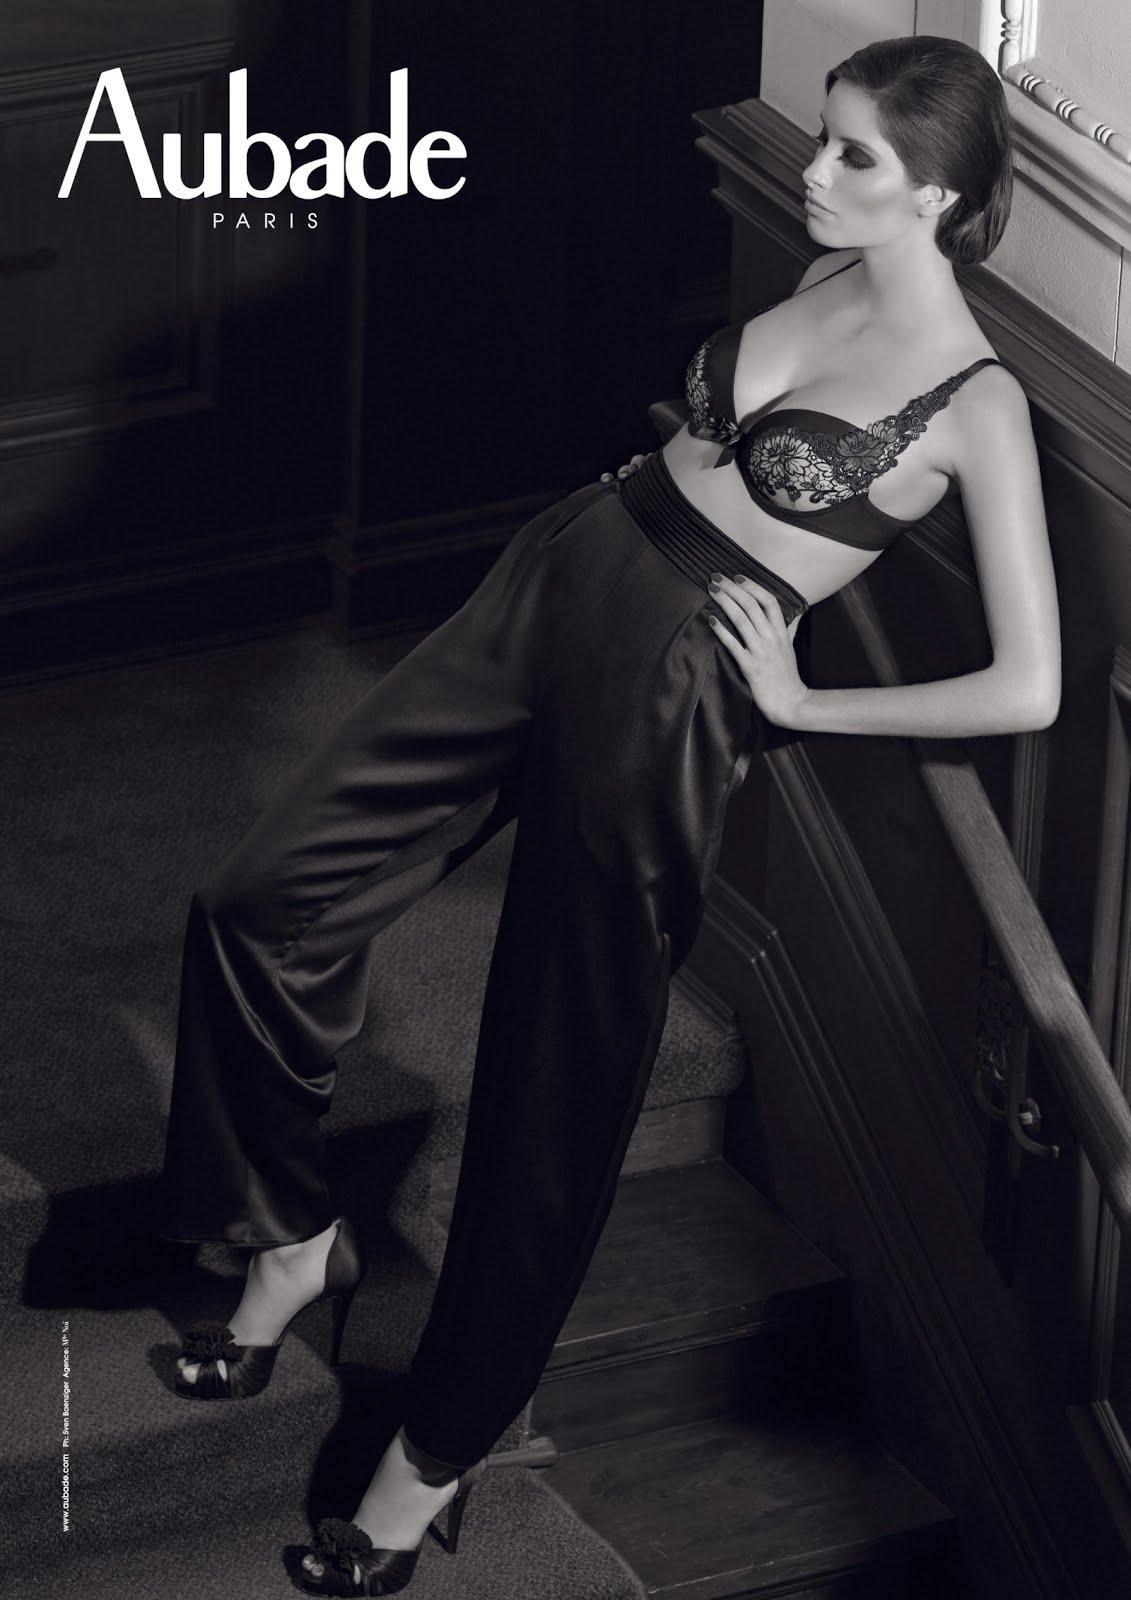 camille piazza aubade lingerie collection lingerie models. Black Bedroom Furniture Sets. Home Design Ideas